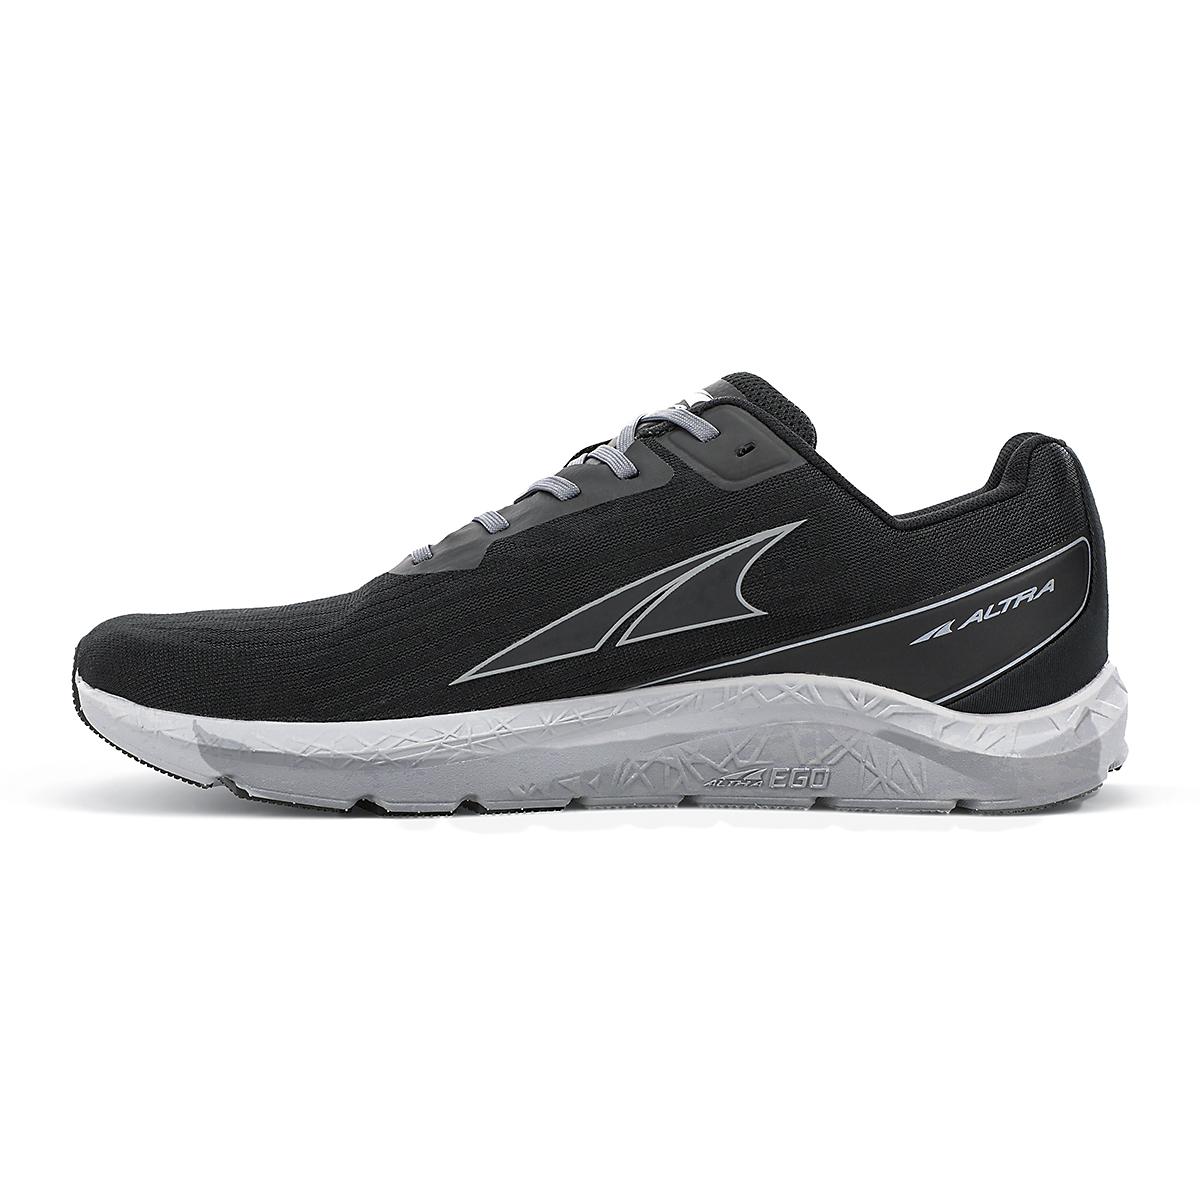 Men's Altra Rivera Running Shoe - Color: Black/Gray - Size: 7 - Width: Regular, Black/Gray, large, image 2